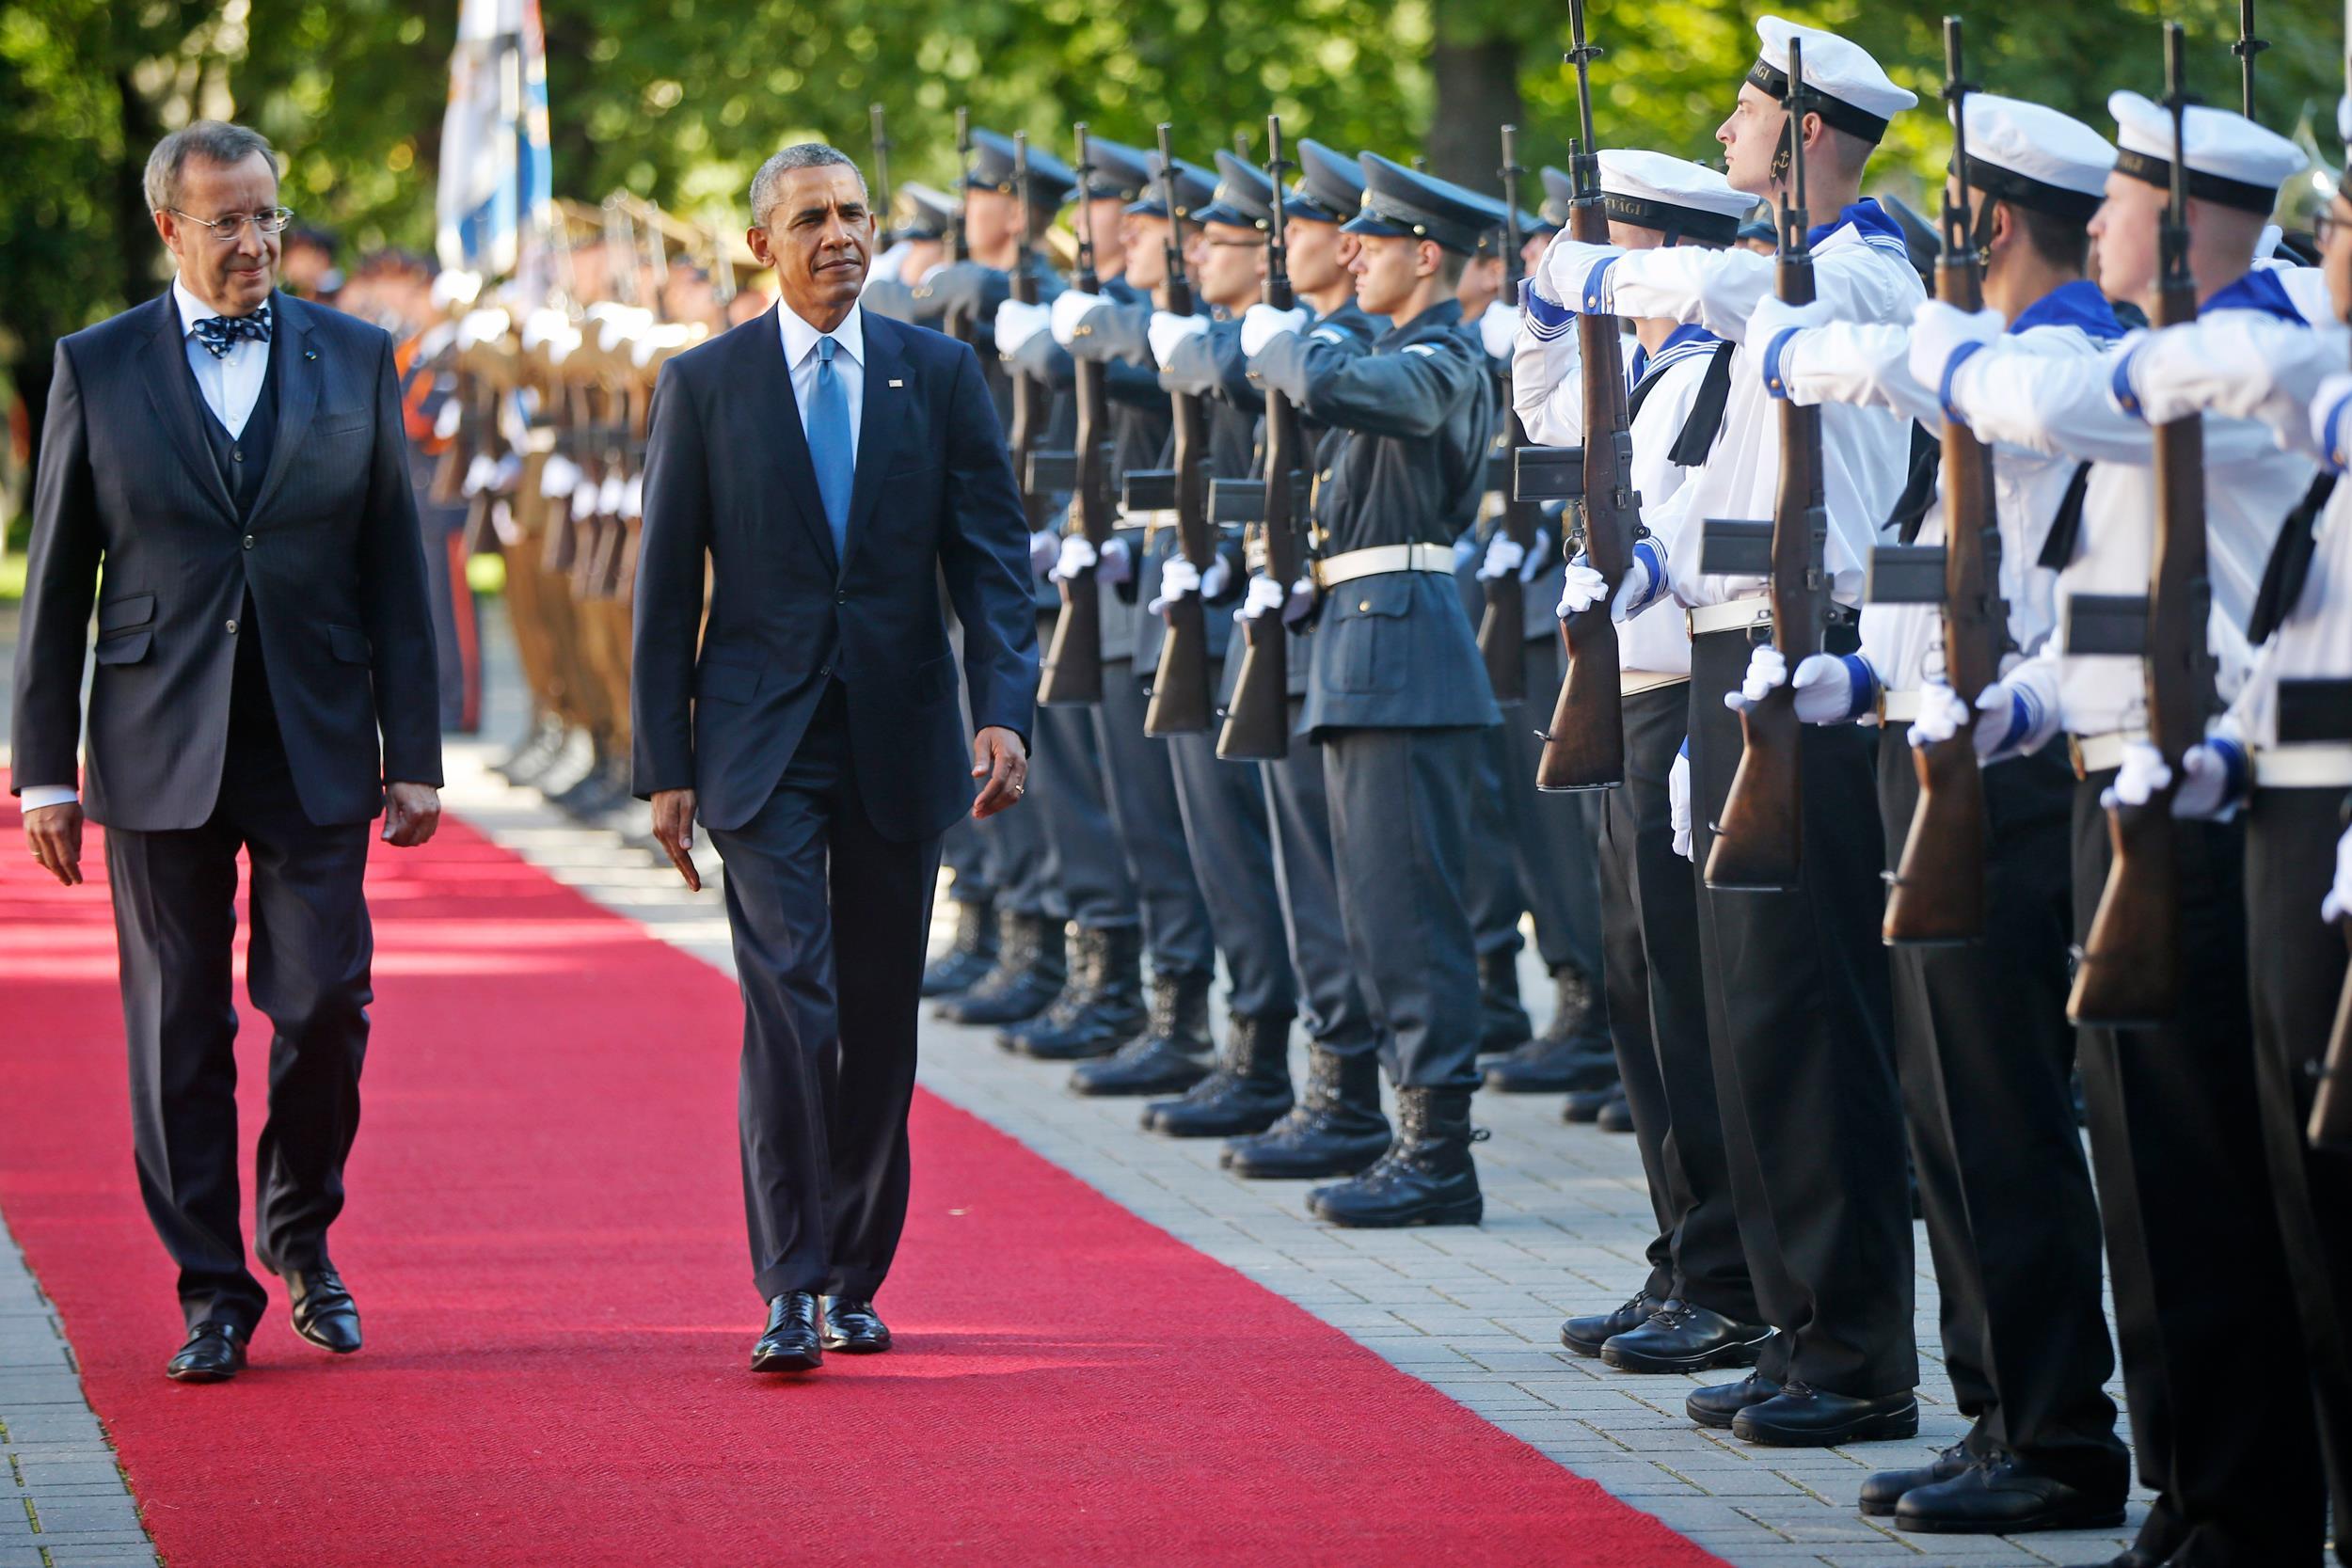 Image: Barack Obama, Toomas Hendrik Ilves